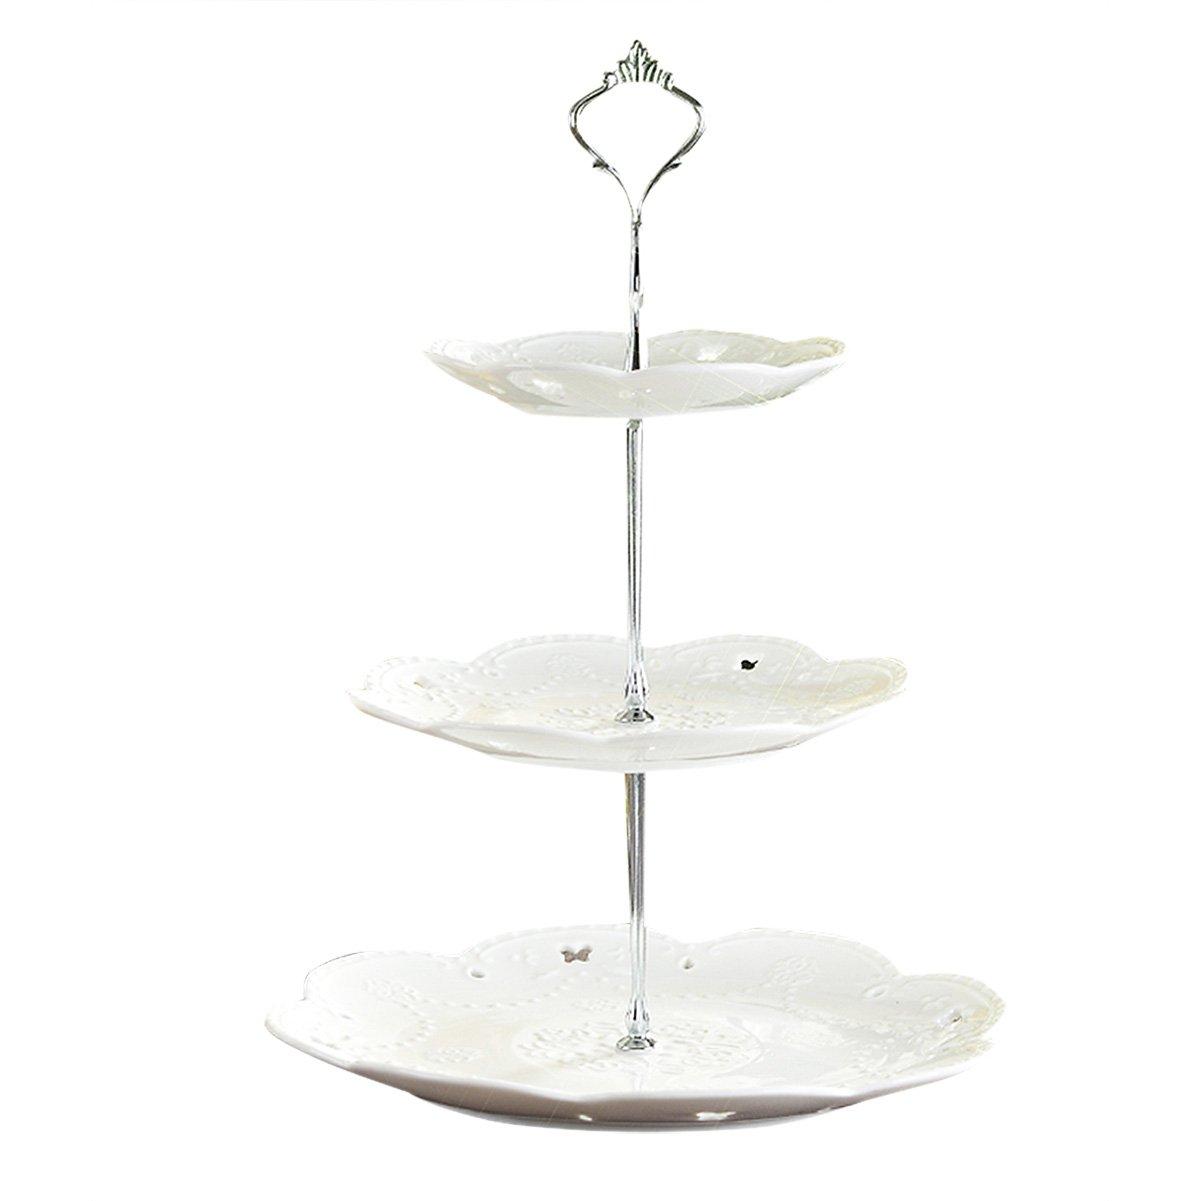 TiaoBug 3 Tier Cake Stand Cake Plate Display Holder Handle Fittings for Tea Shop Room Hotel (Silver) by TiaoBug (Image #2)